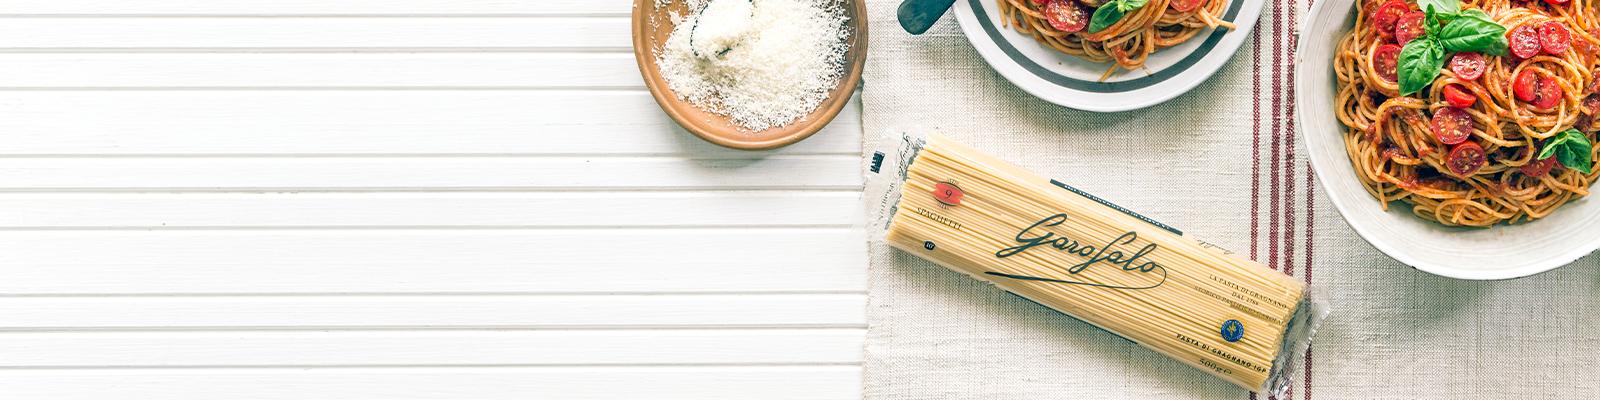 Pasta Garofalo - Durum Wheat Semolina Pasta